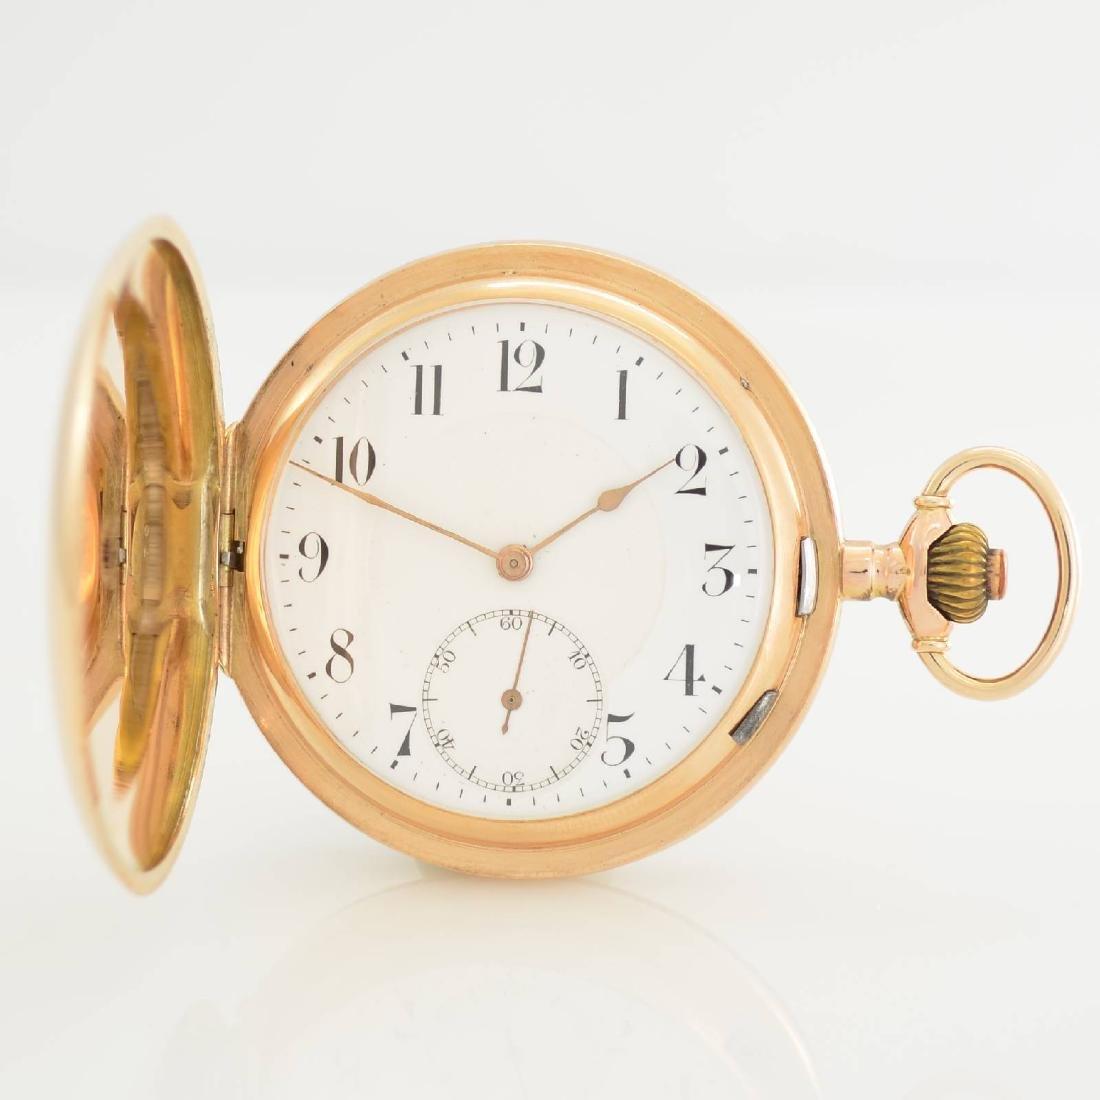 L.U.C. Chopard 14k pink gold pocket watch